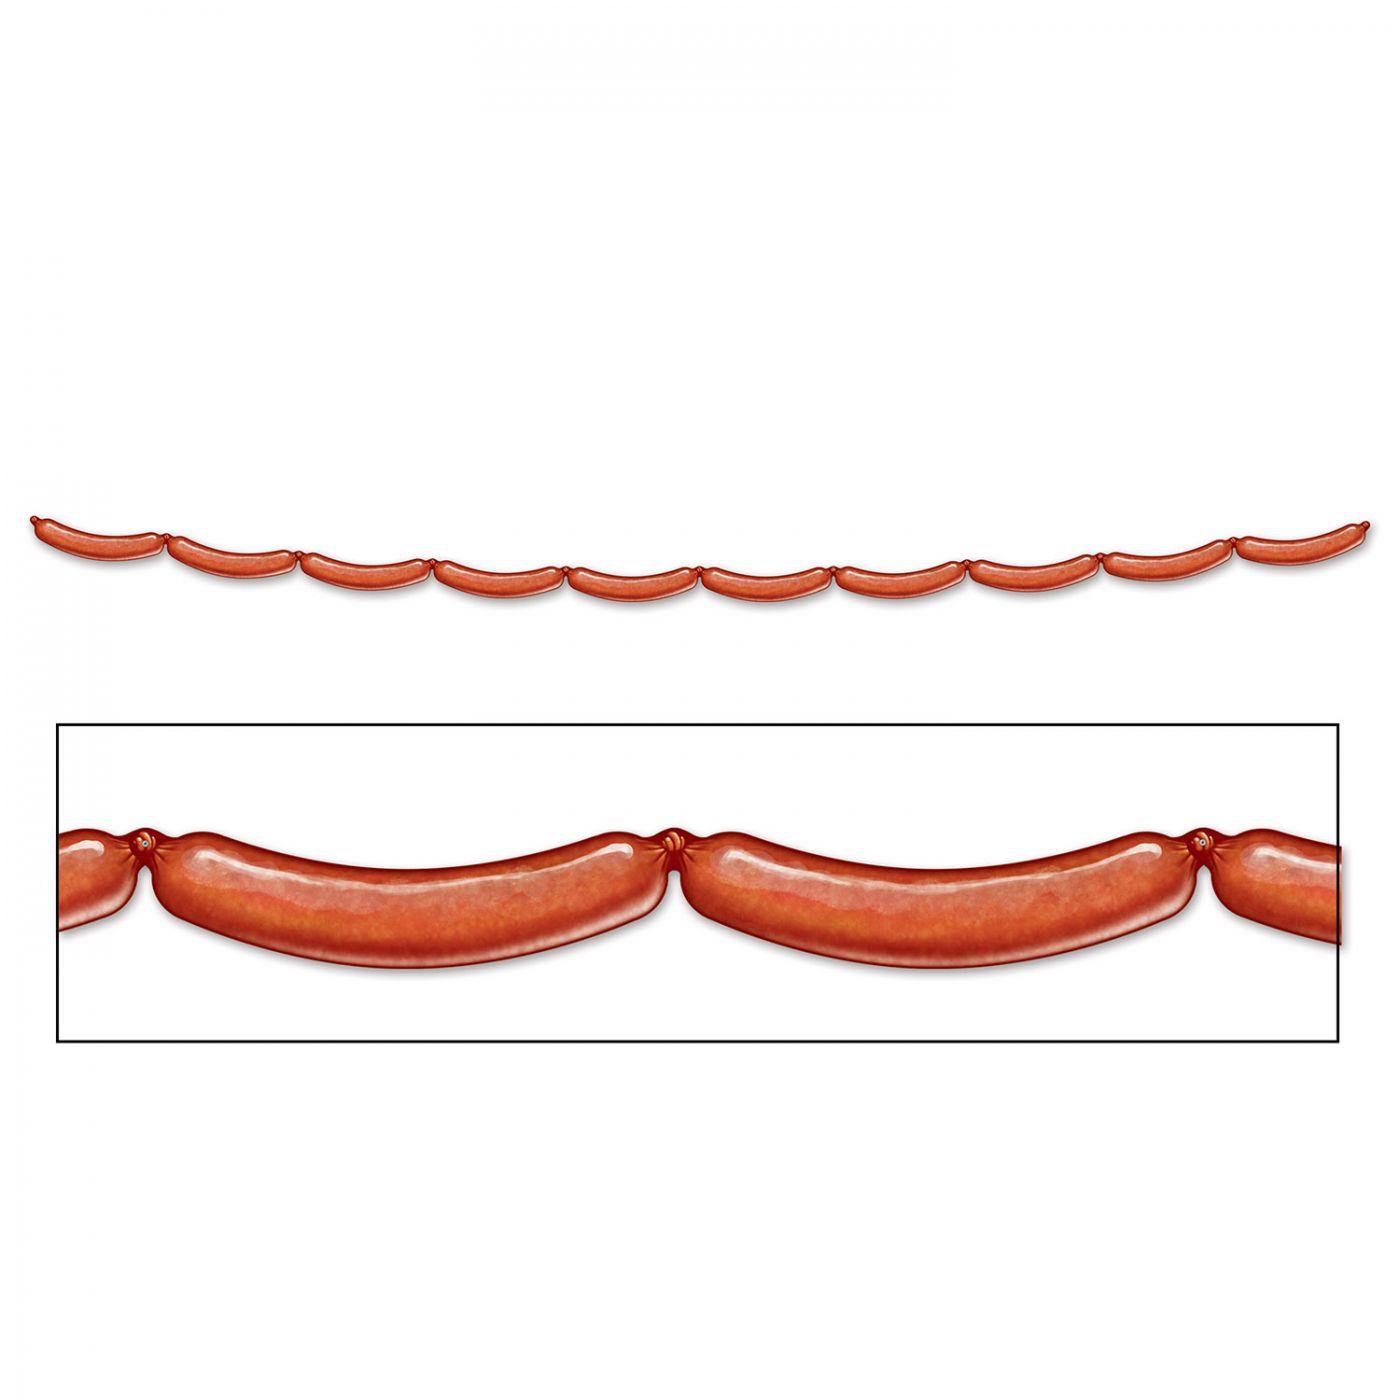 Bratwurst Streamer image